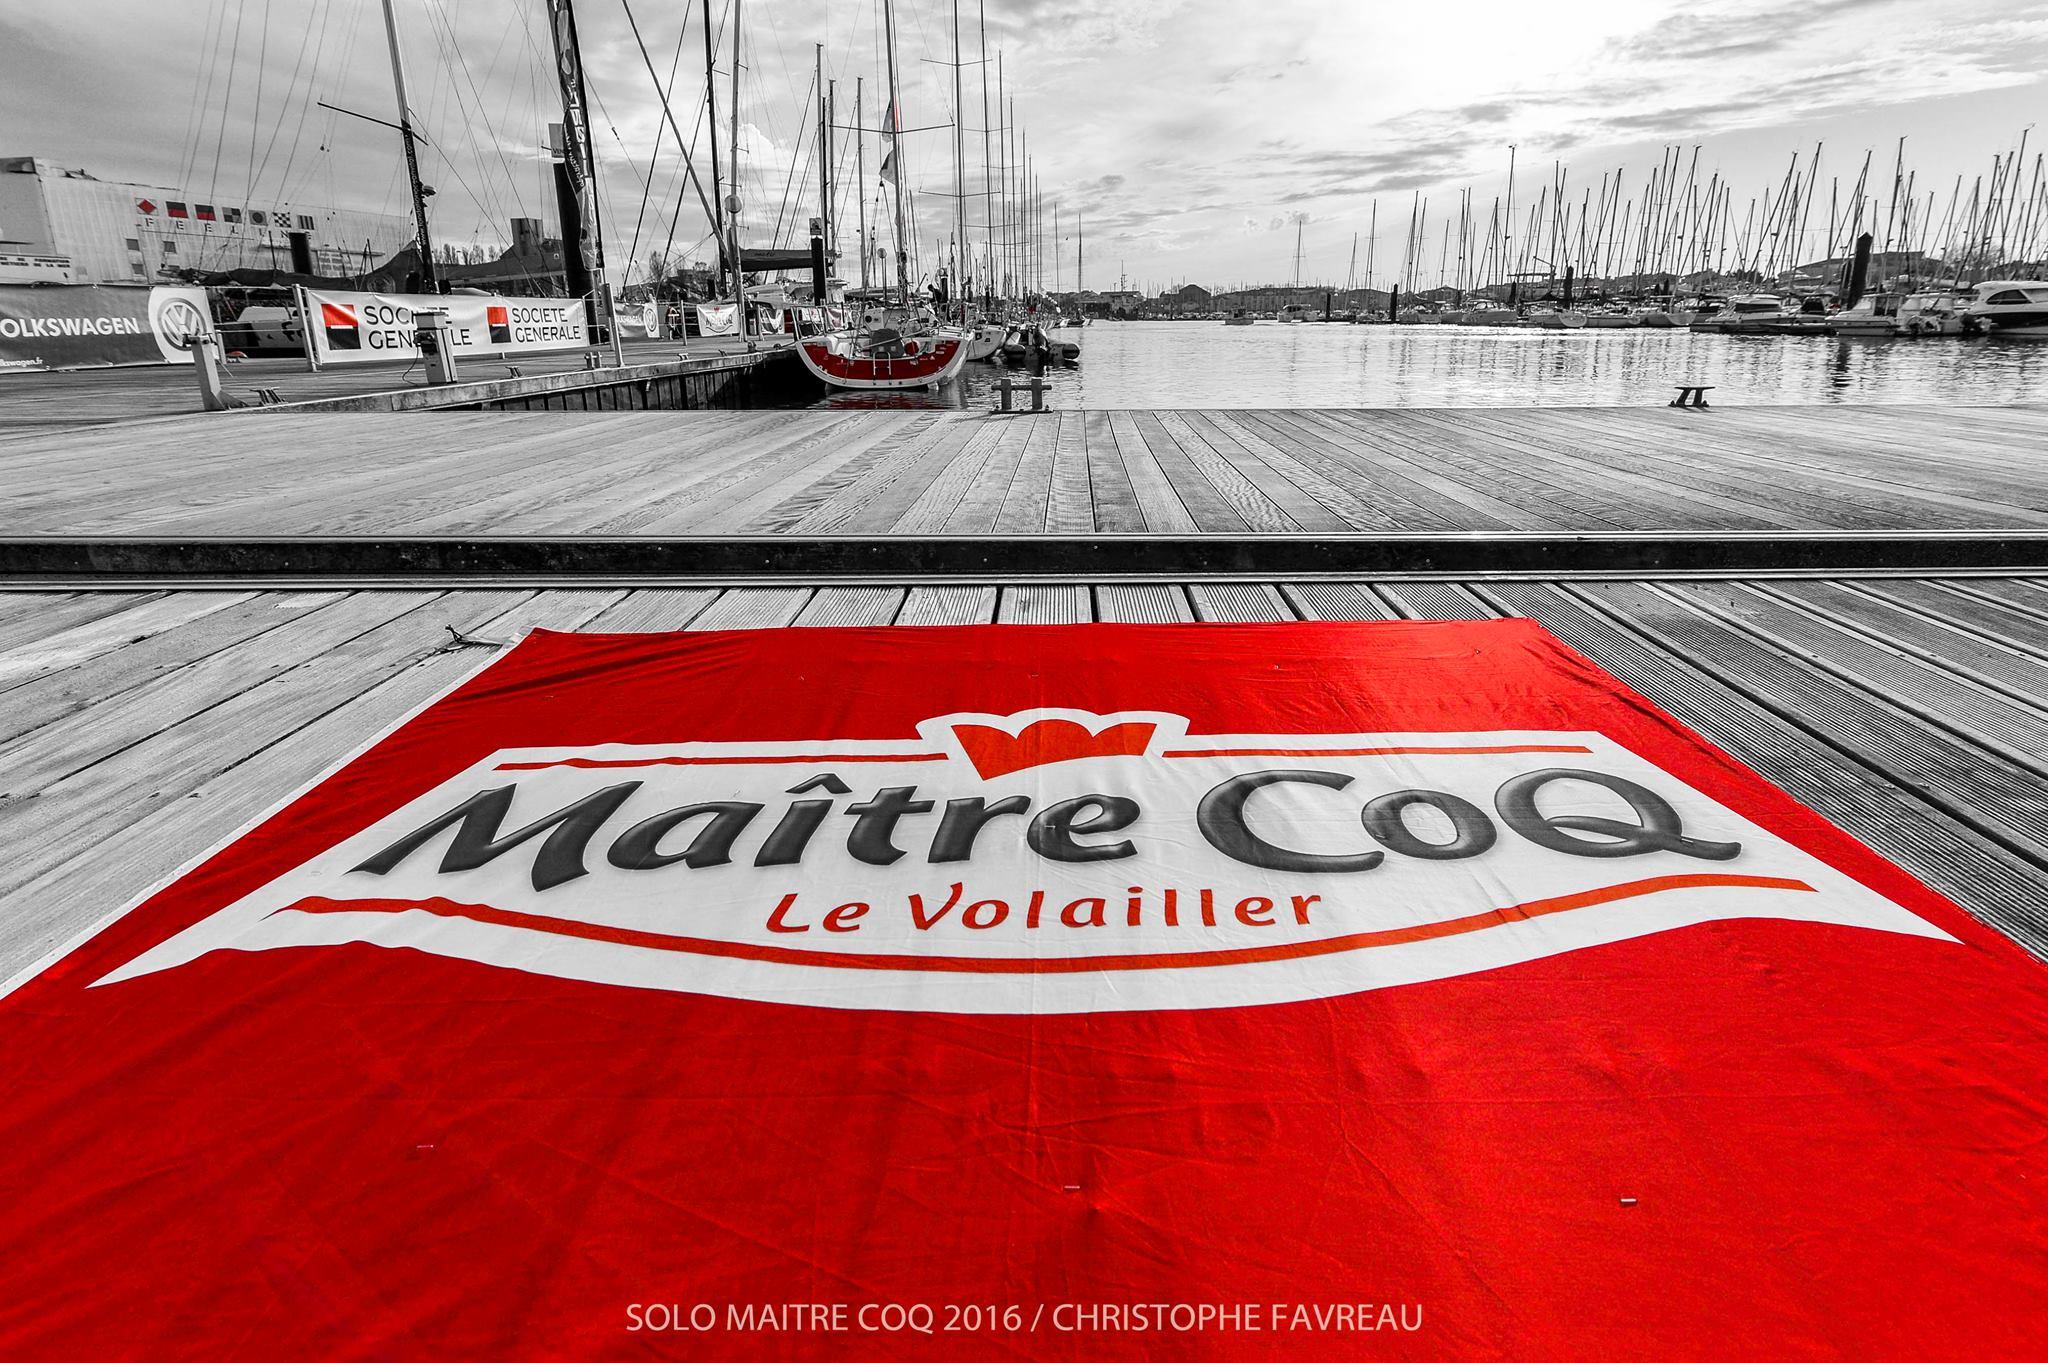 2016-04-14 Solo Maître CoQ - Preparatifs - credit photo Christophe Favreau